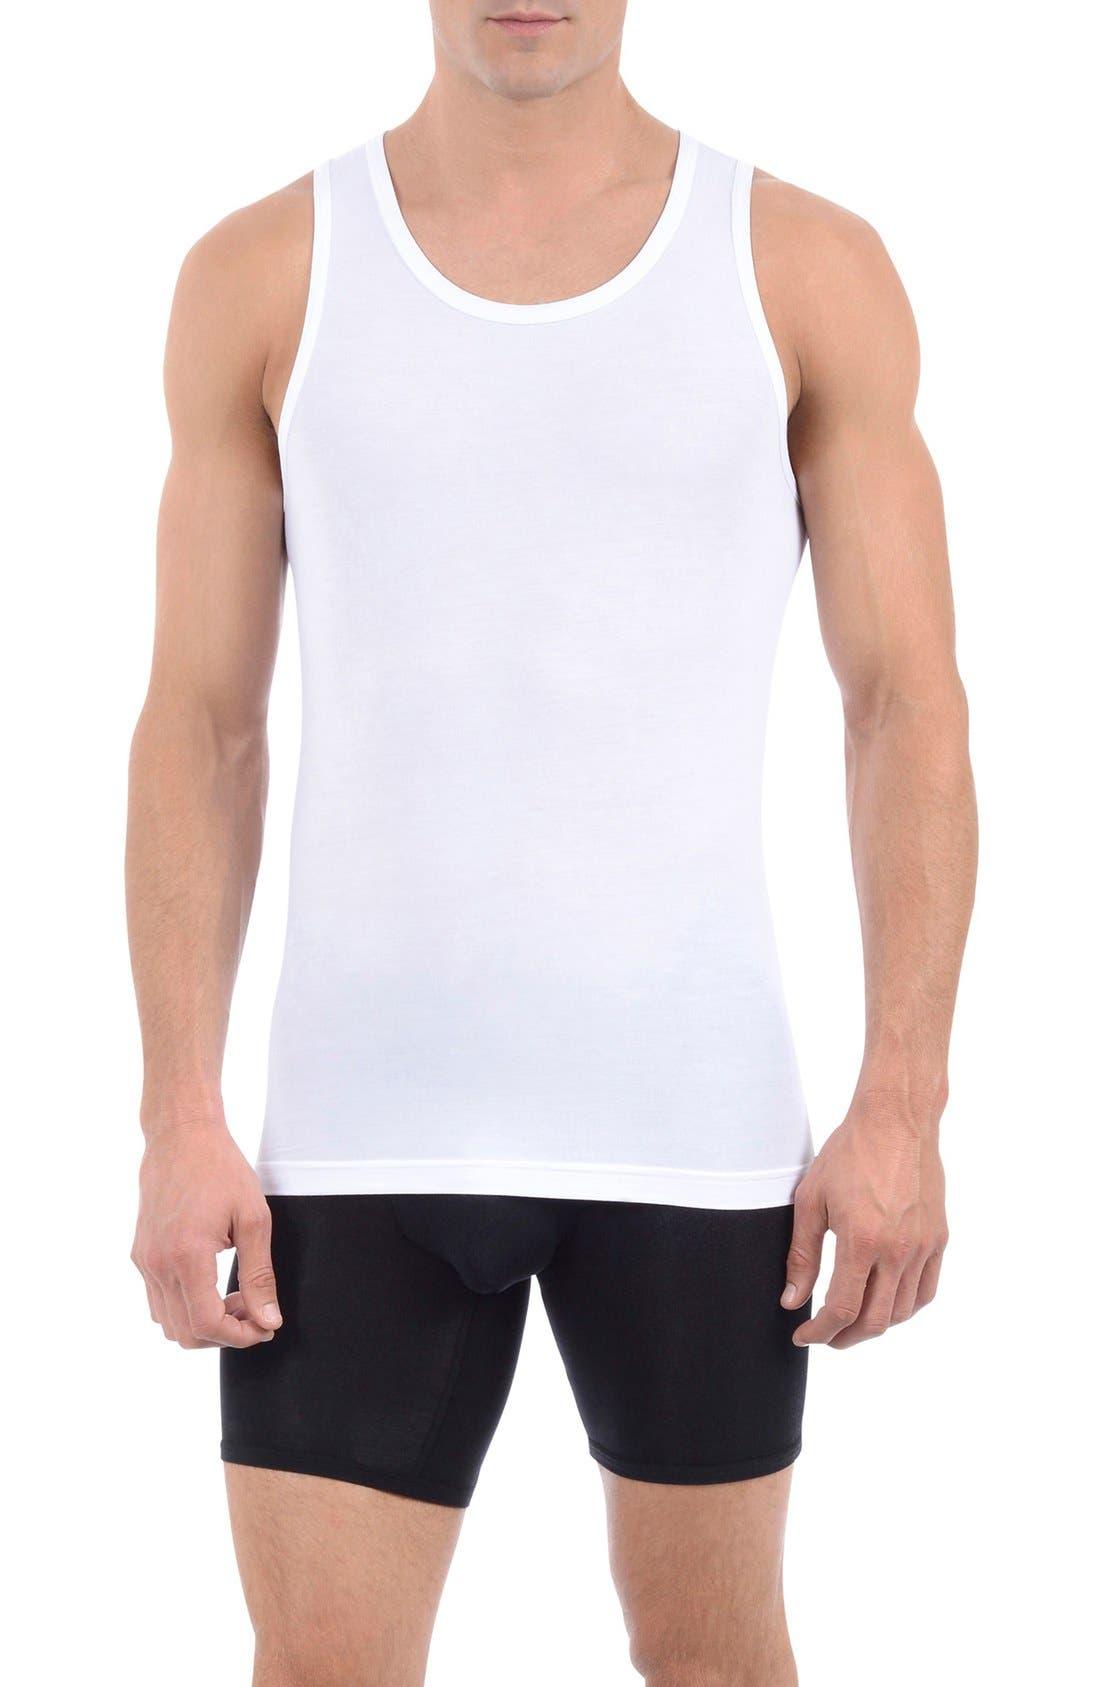 Tommy John 'Second Skin' Tank Undershirt